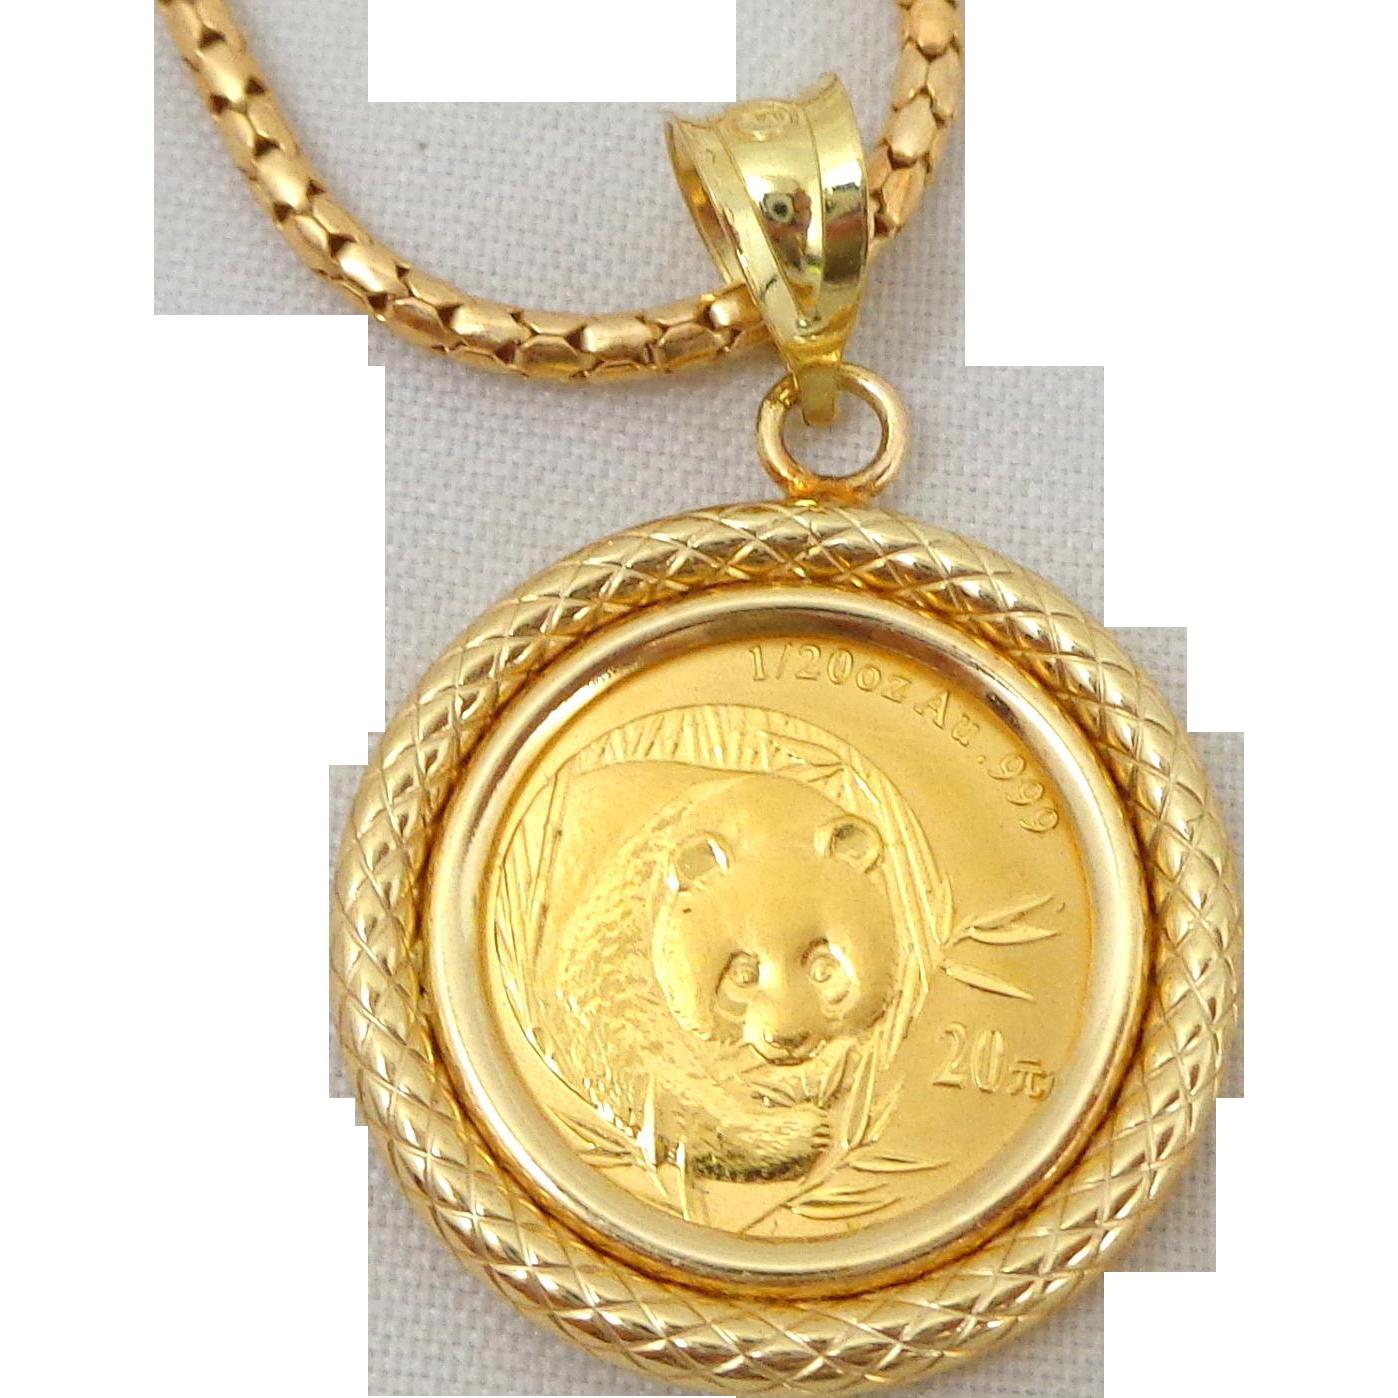 Estate .999 Gold Panda Coin on 18K Necklace & Bezel Original Box